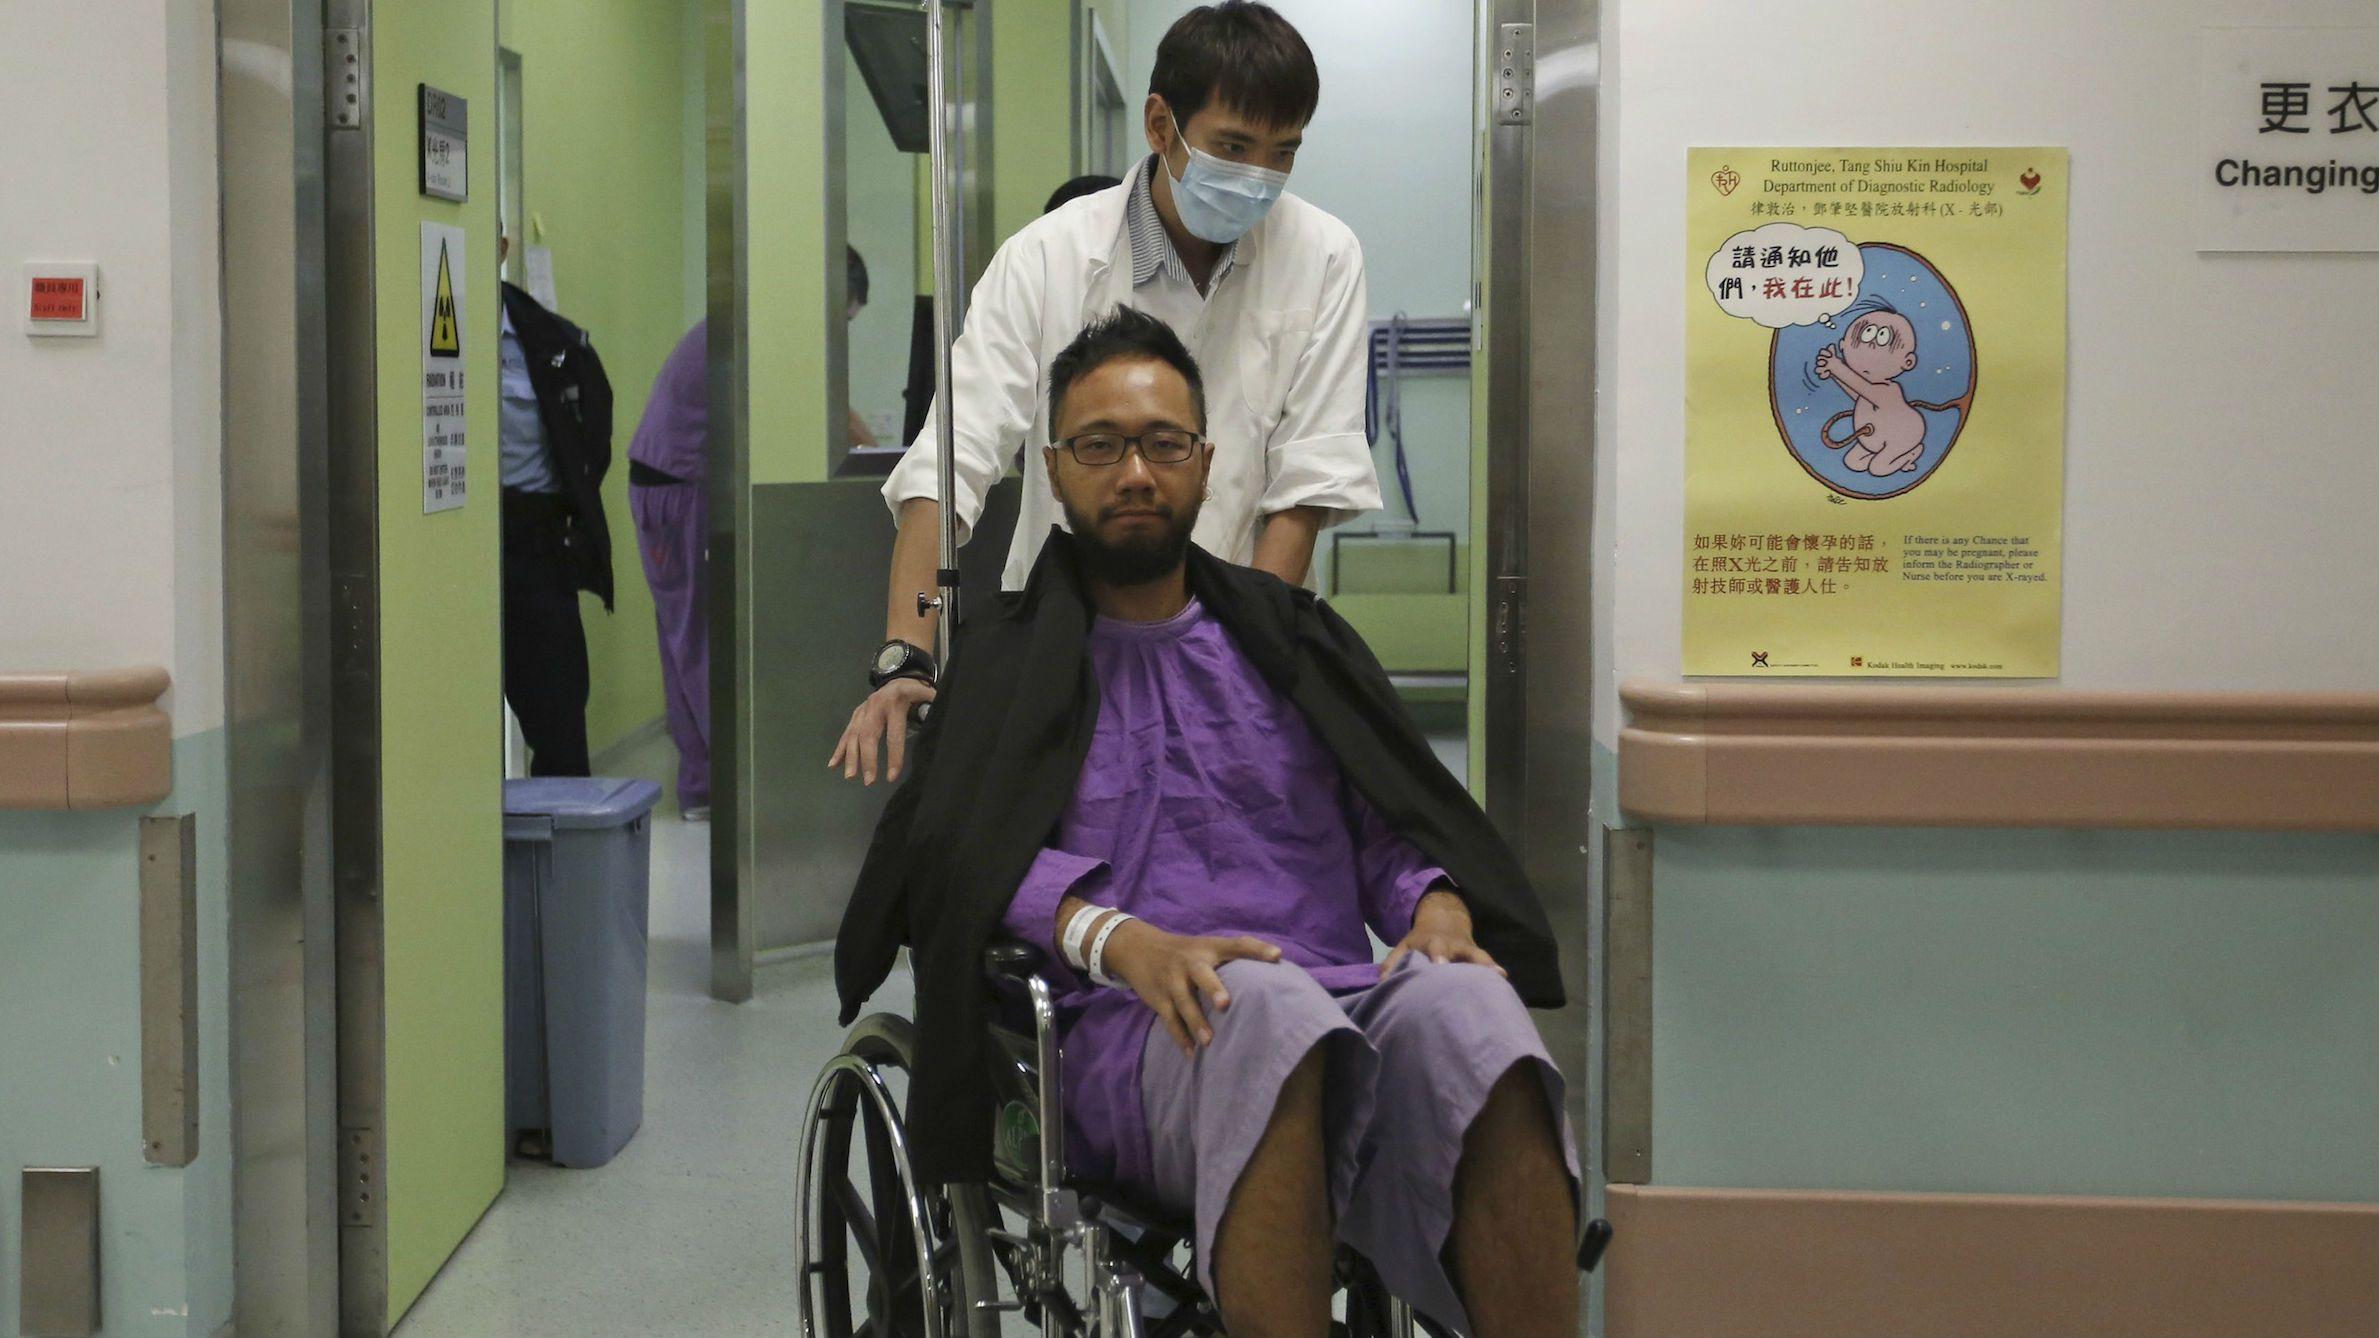 A hospital staff pushes Ken Tsang Kin-chiu on a wheelchair for a medical examination at Ruttonjee Hospital in Hong Kong